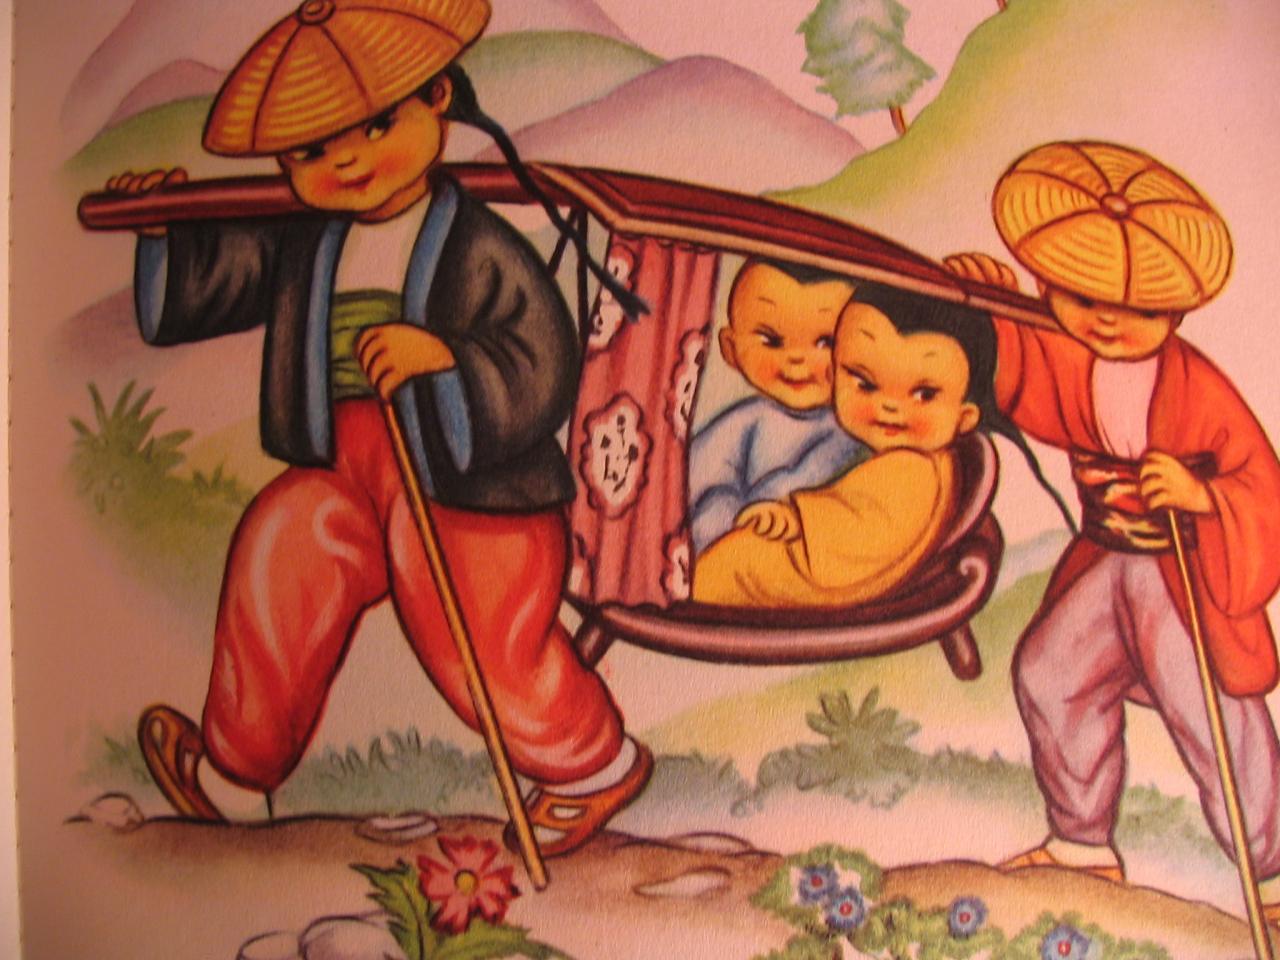 De joyeux petits chinois